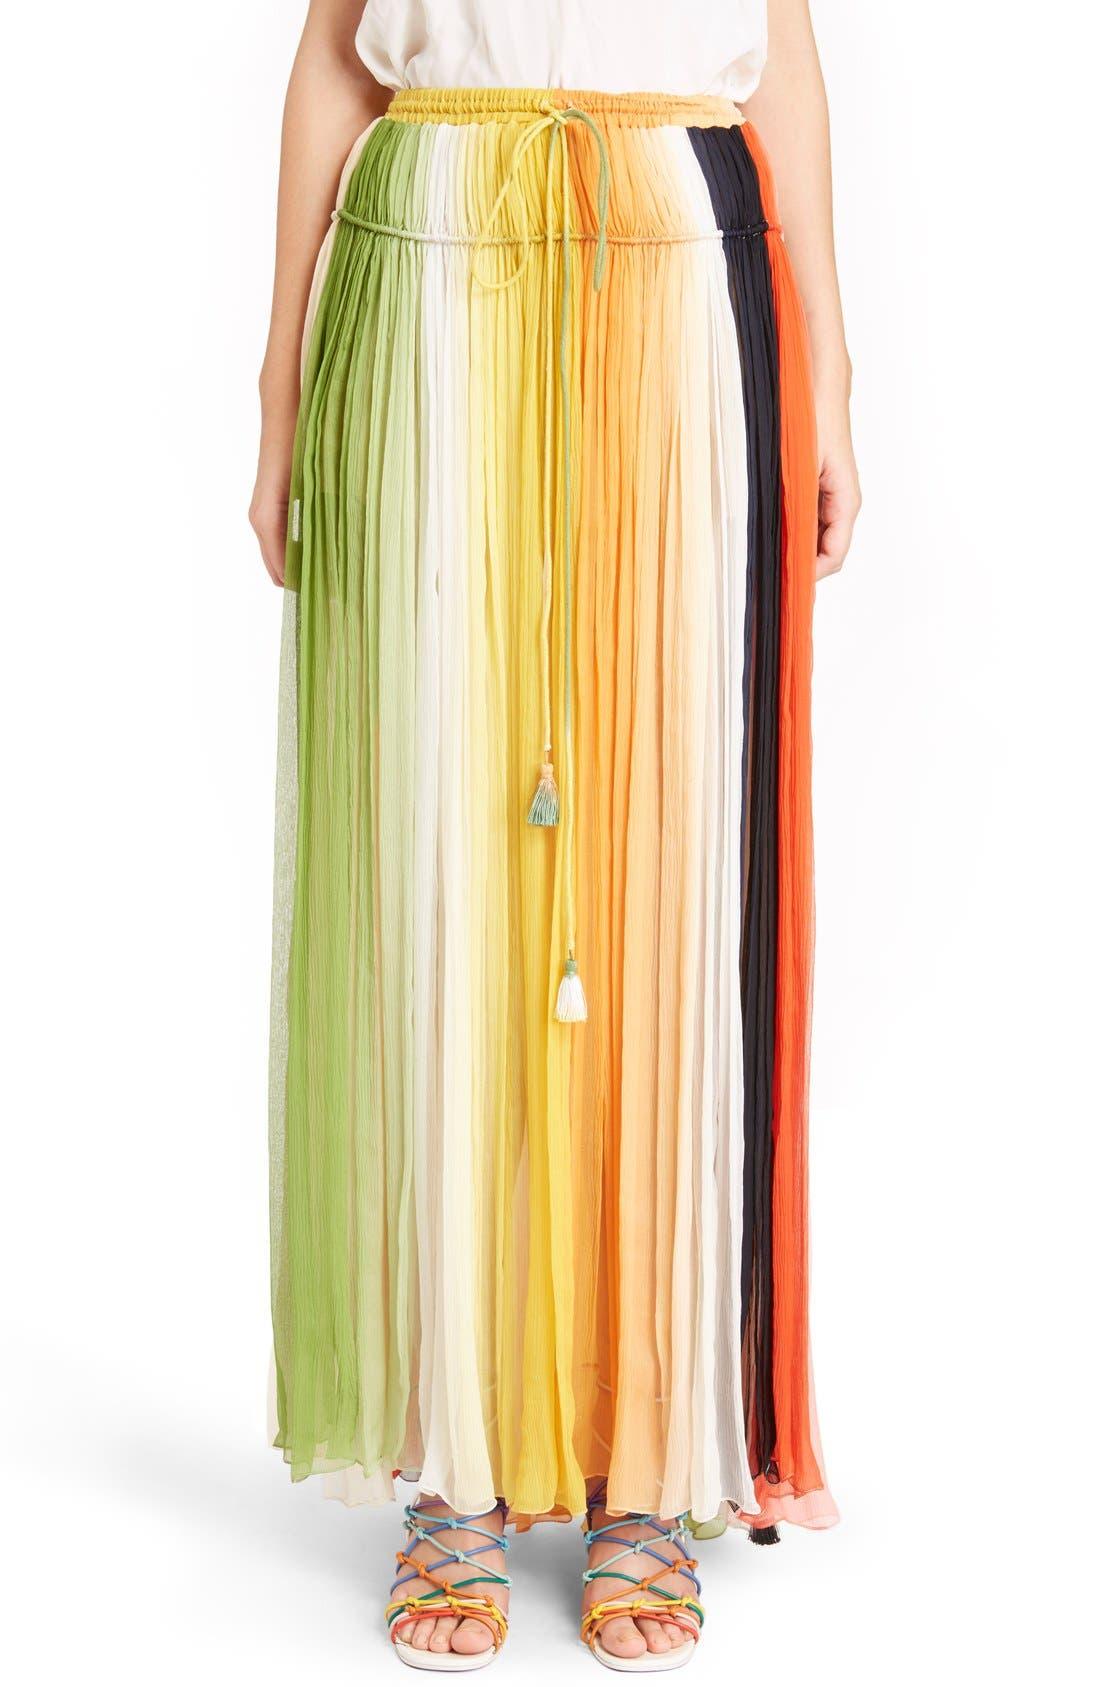 Stripe Pleated Silk Skirt with Tassels,                         Main,                         color, Orange/ Green